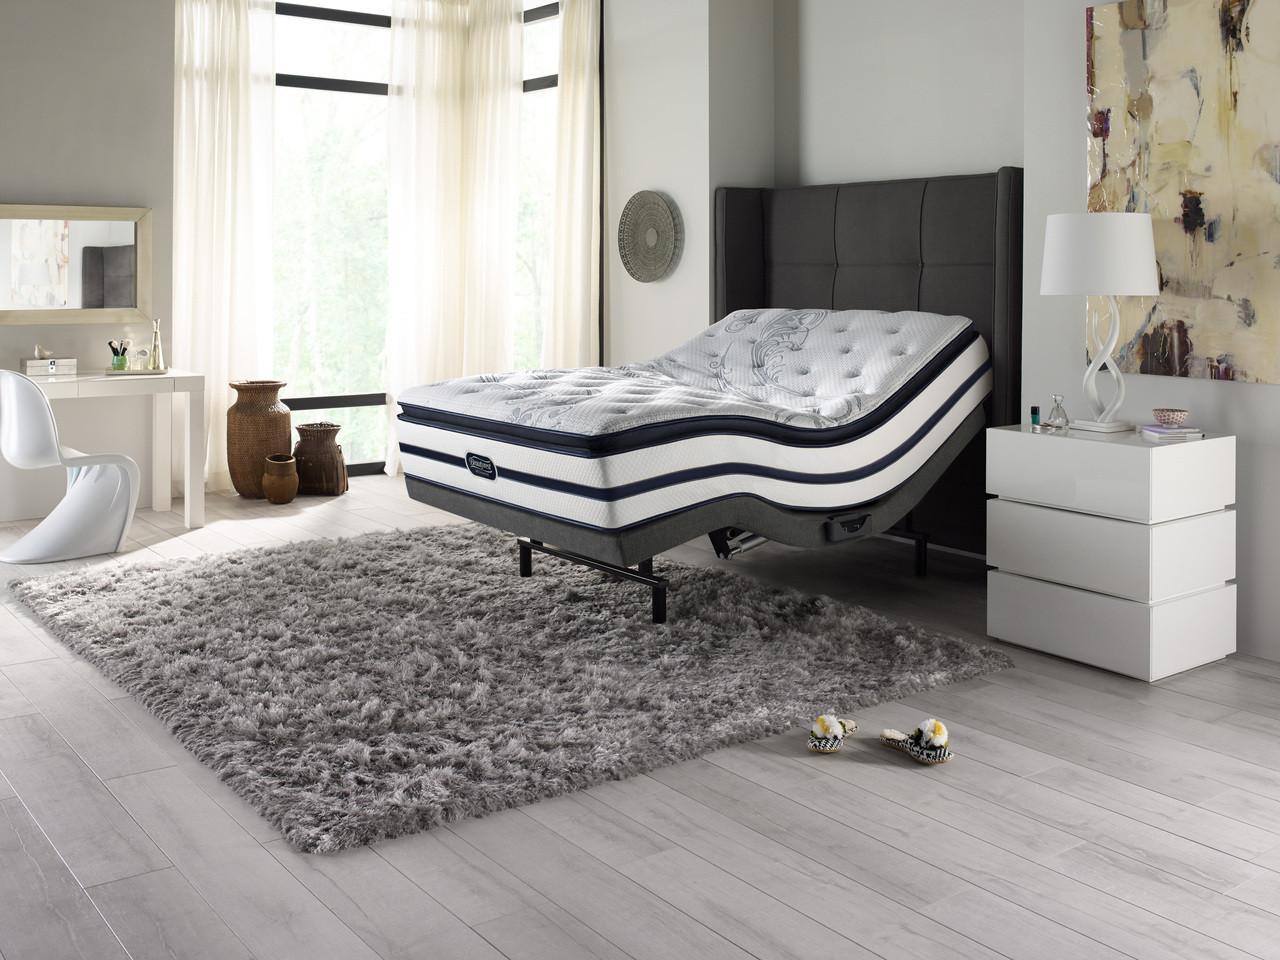 Beautyrest Recharge Plush Pillow Top Mattress Renew Grey Adjustable